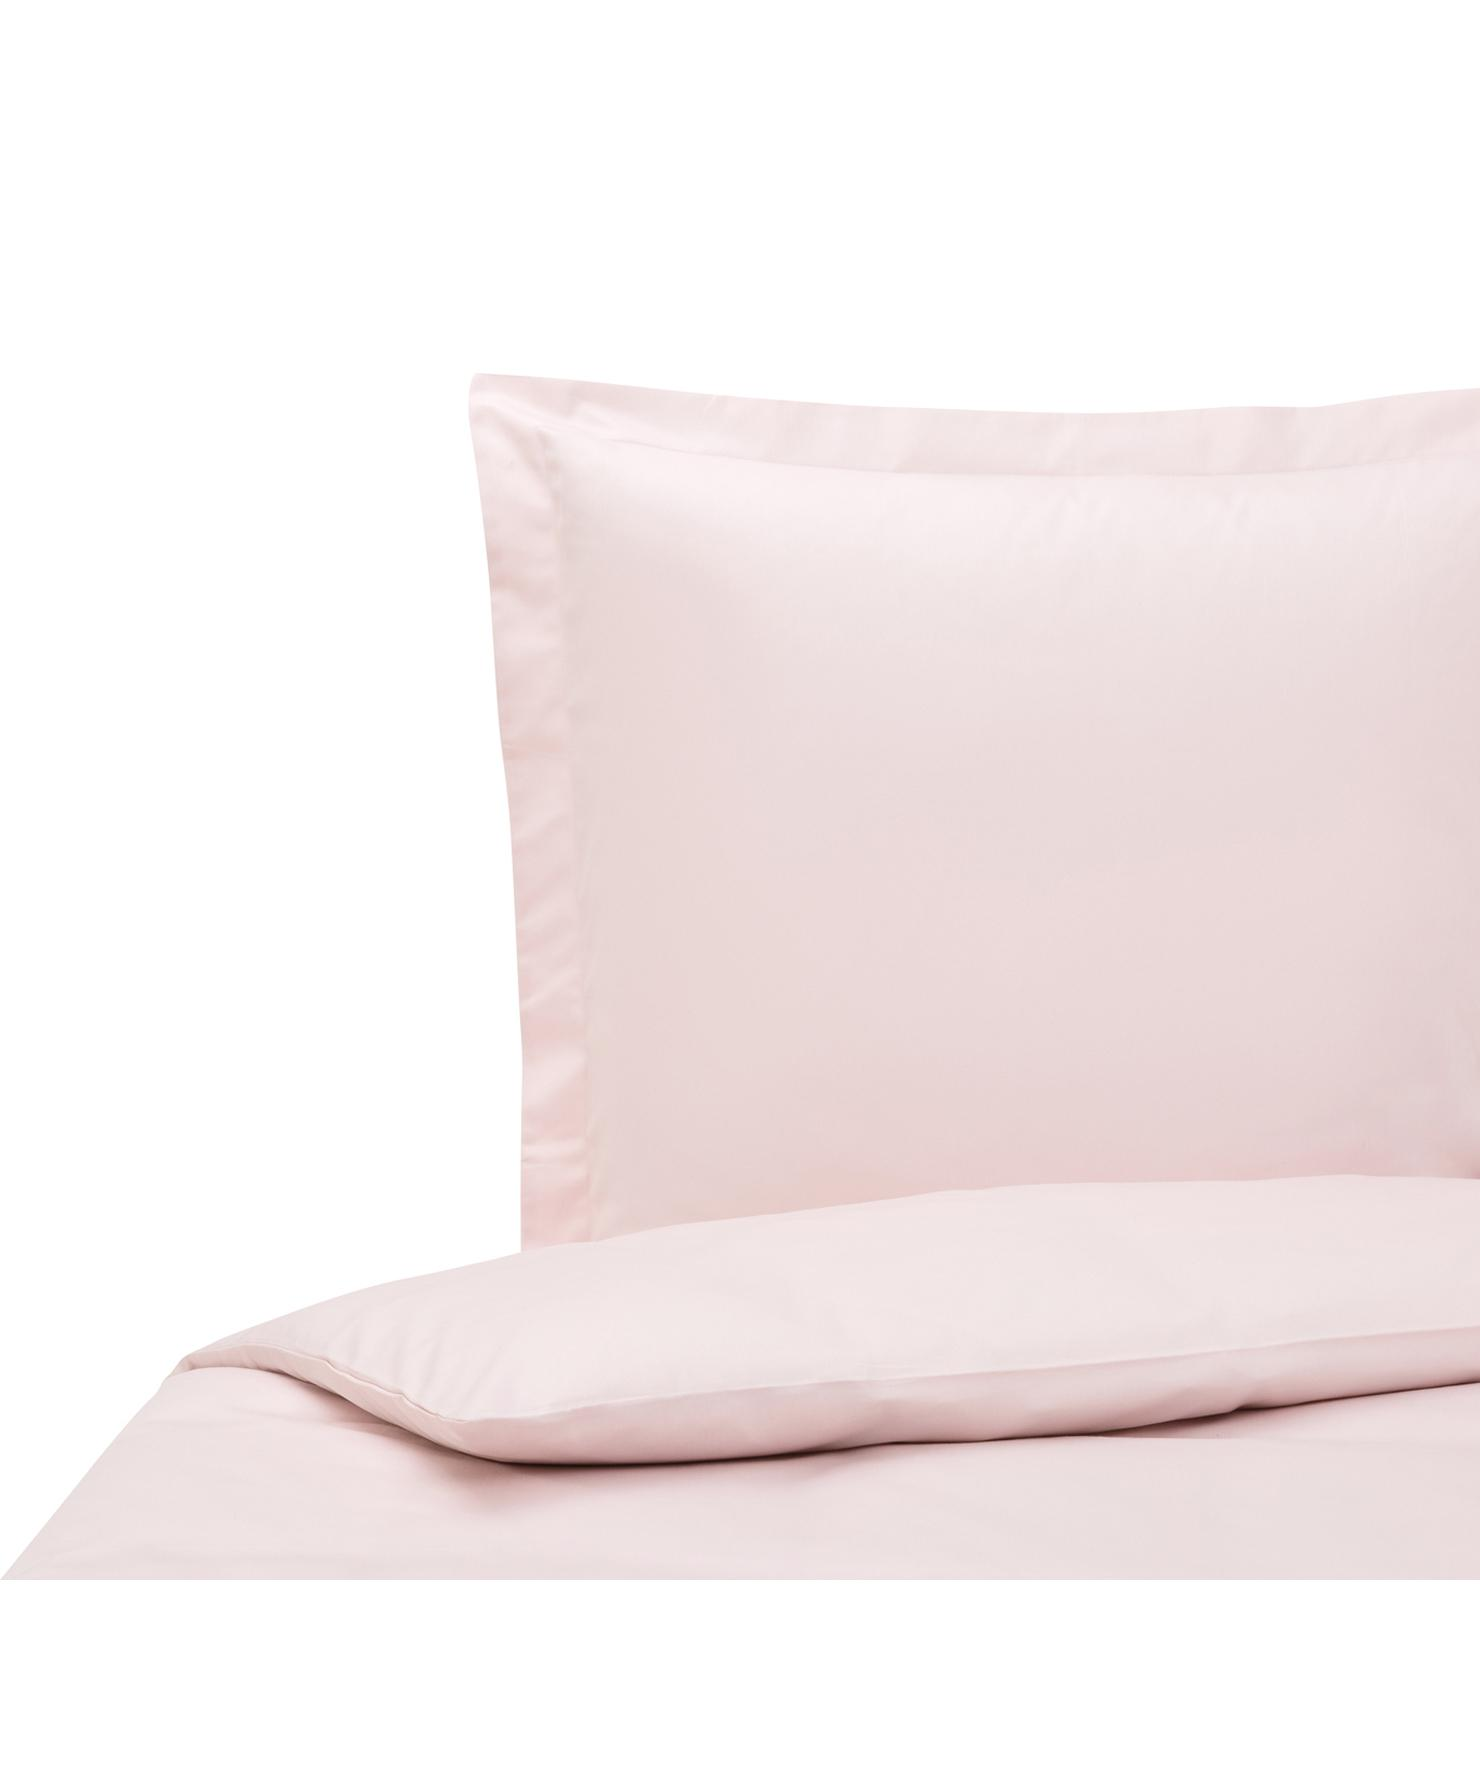 Funda nórdica de satén Premium, Rosa, Cama 90 cm (150 x 200 cm)